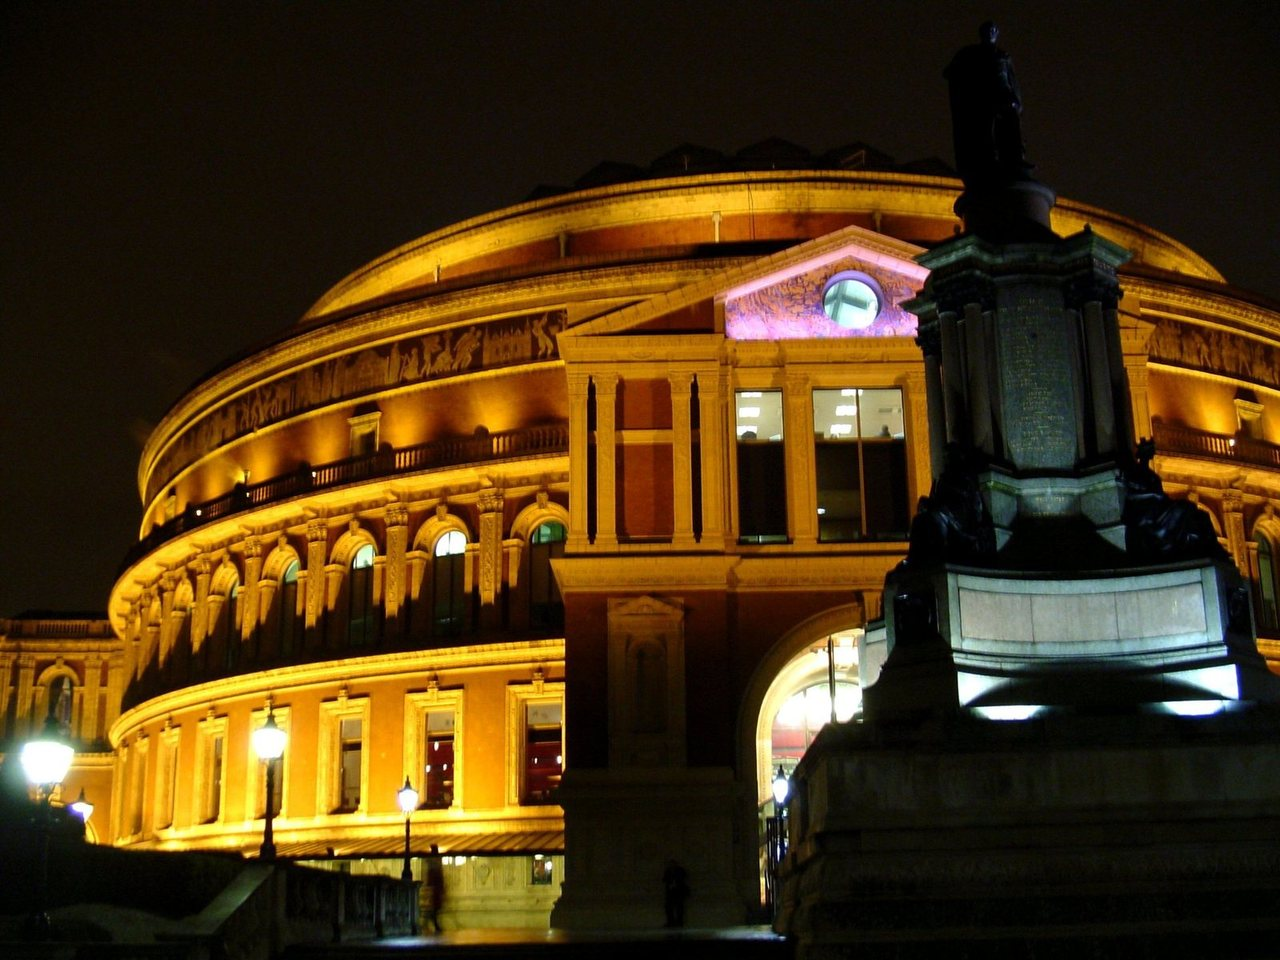 royal-albert-hall-london-by-night-1207457-1280x960